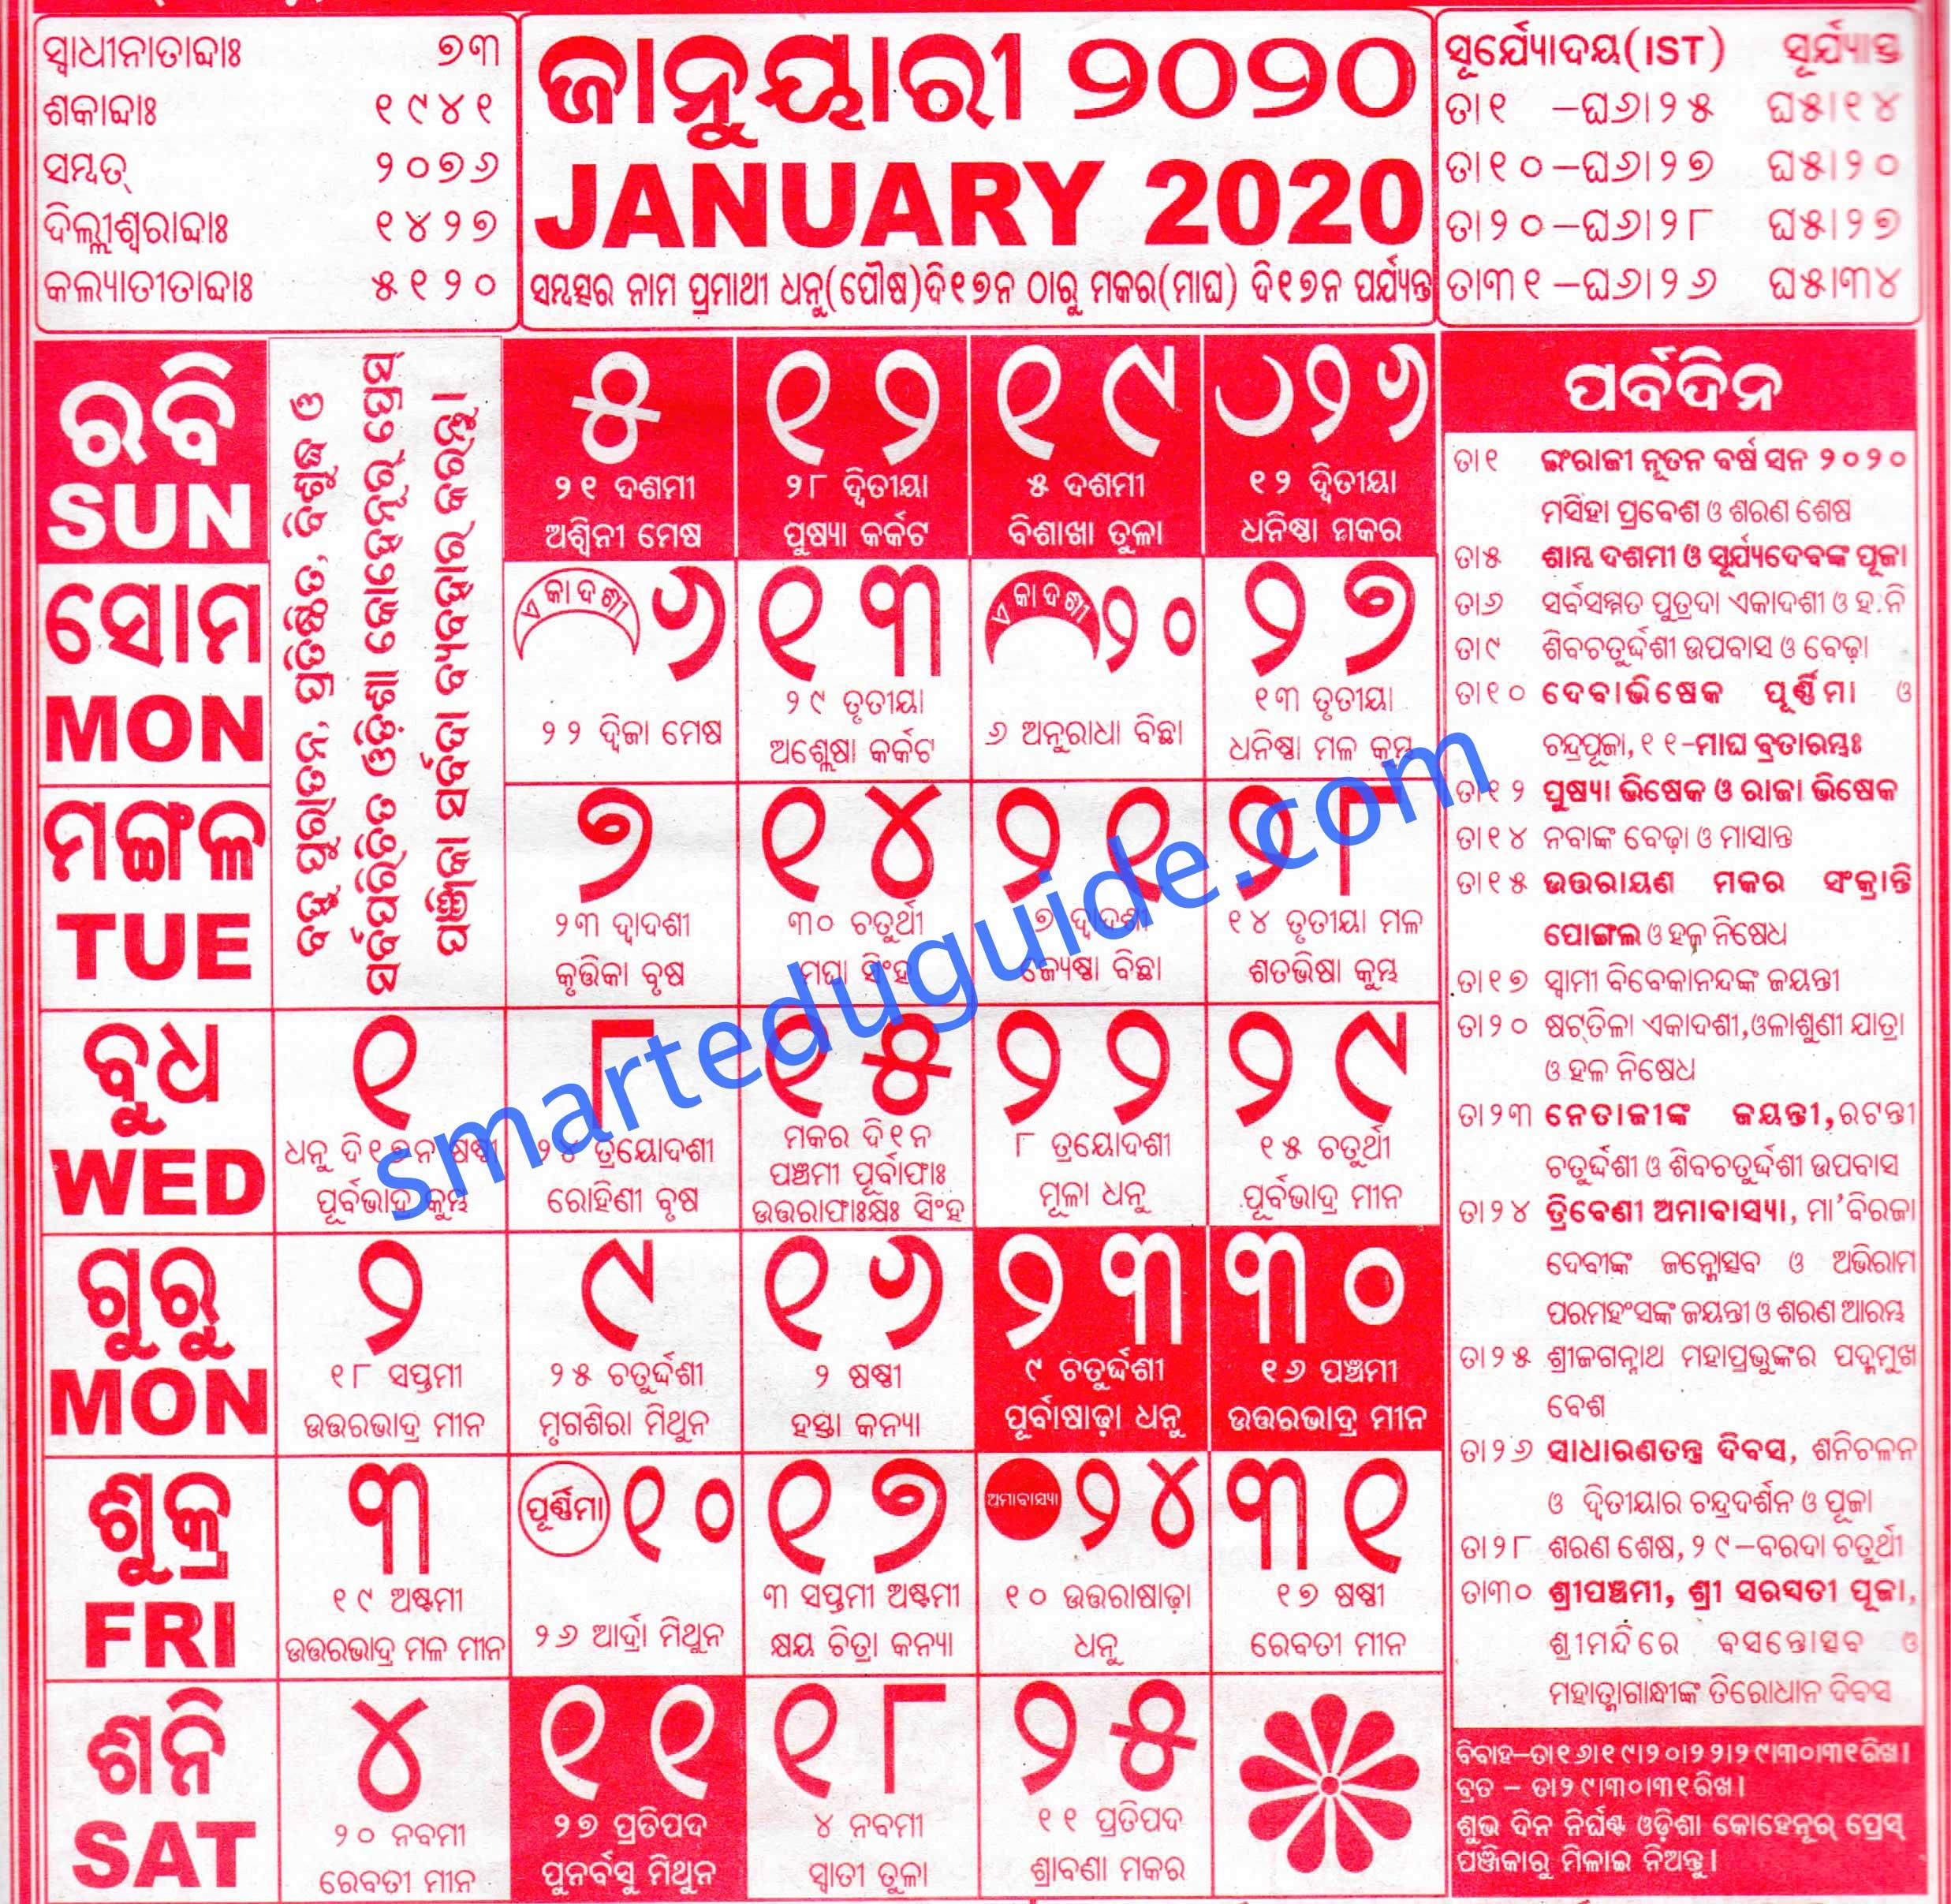 Odia Calendar 2020 Kohinoor Pdf | Seg with regard to Oriya Calendar 2020 February